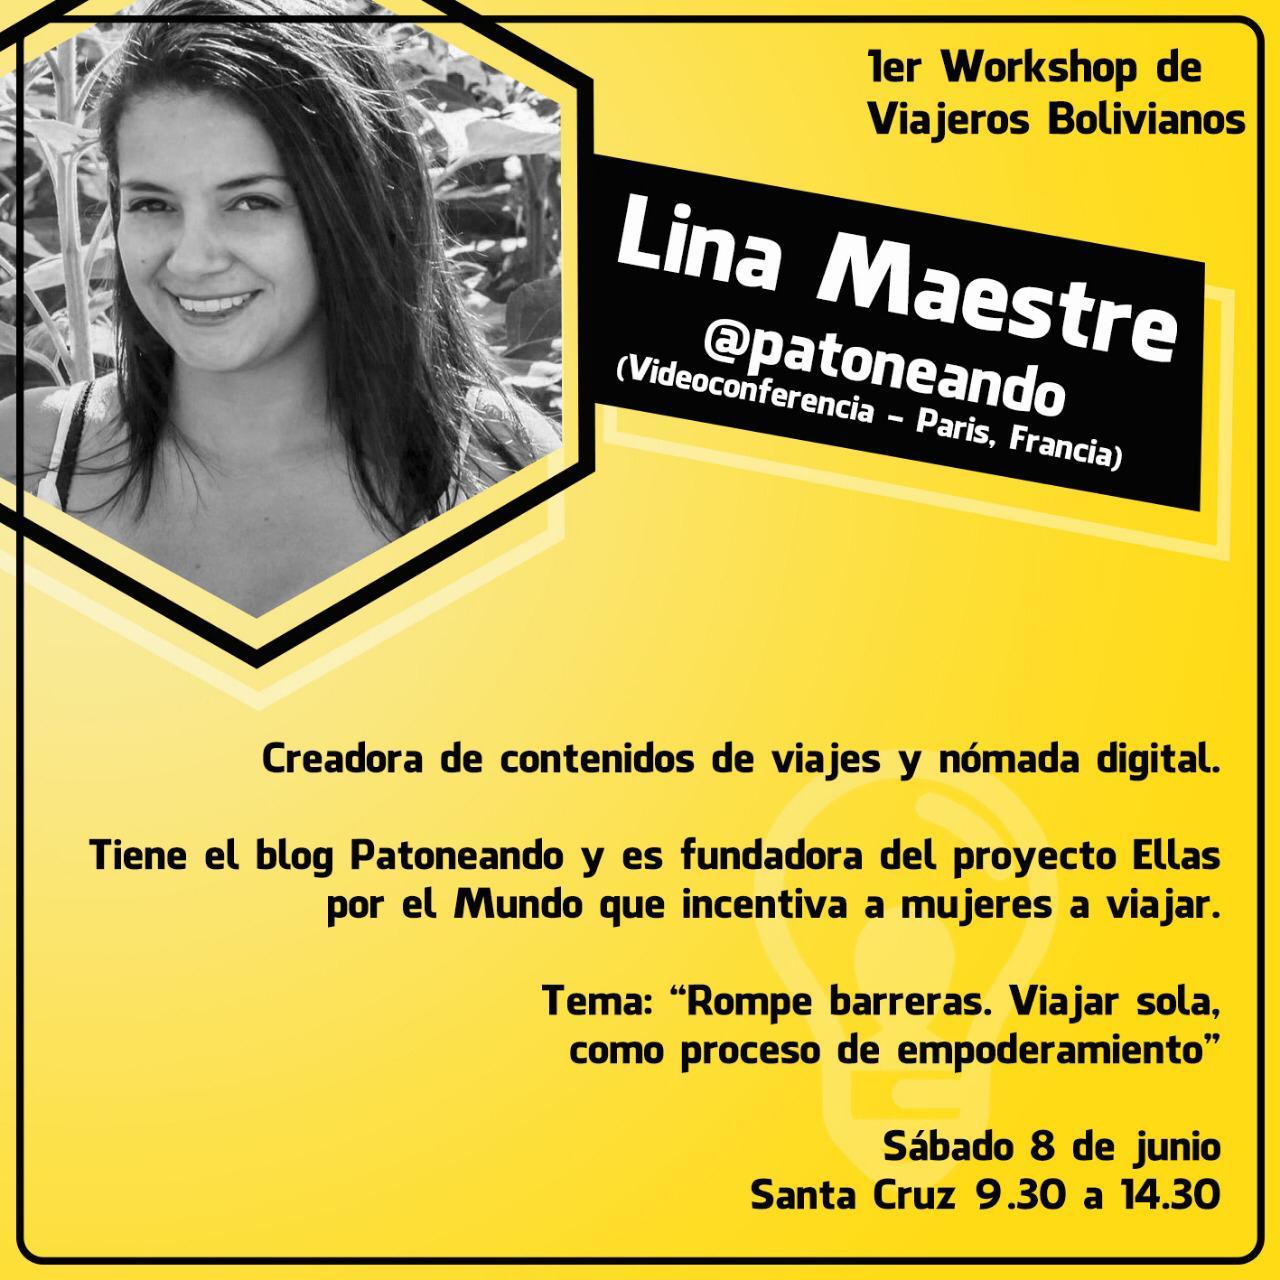 Videoconferencia workshop viajeros Bolivia por Lina Maestre